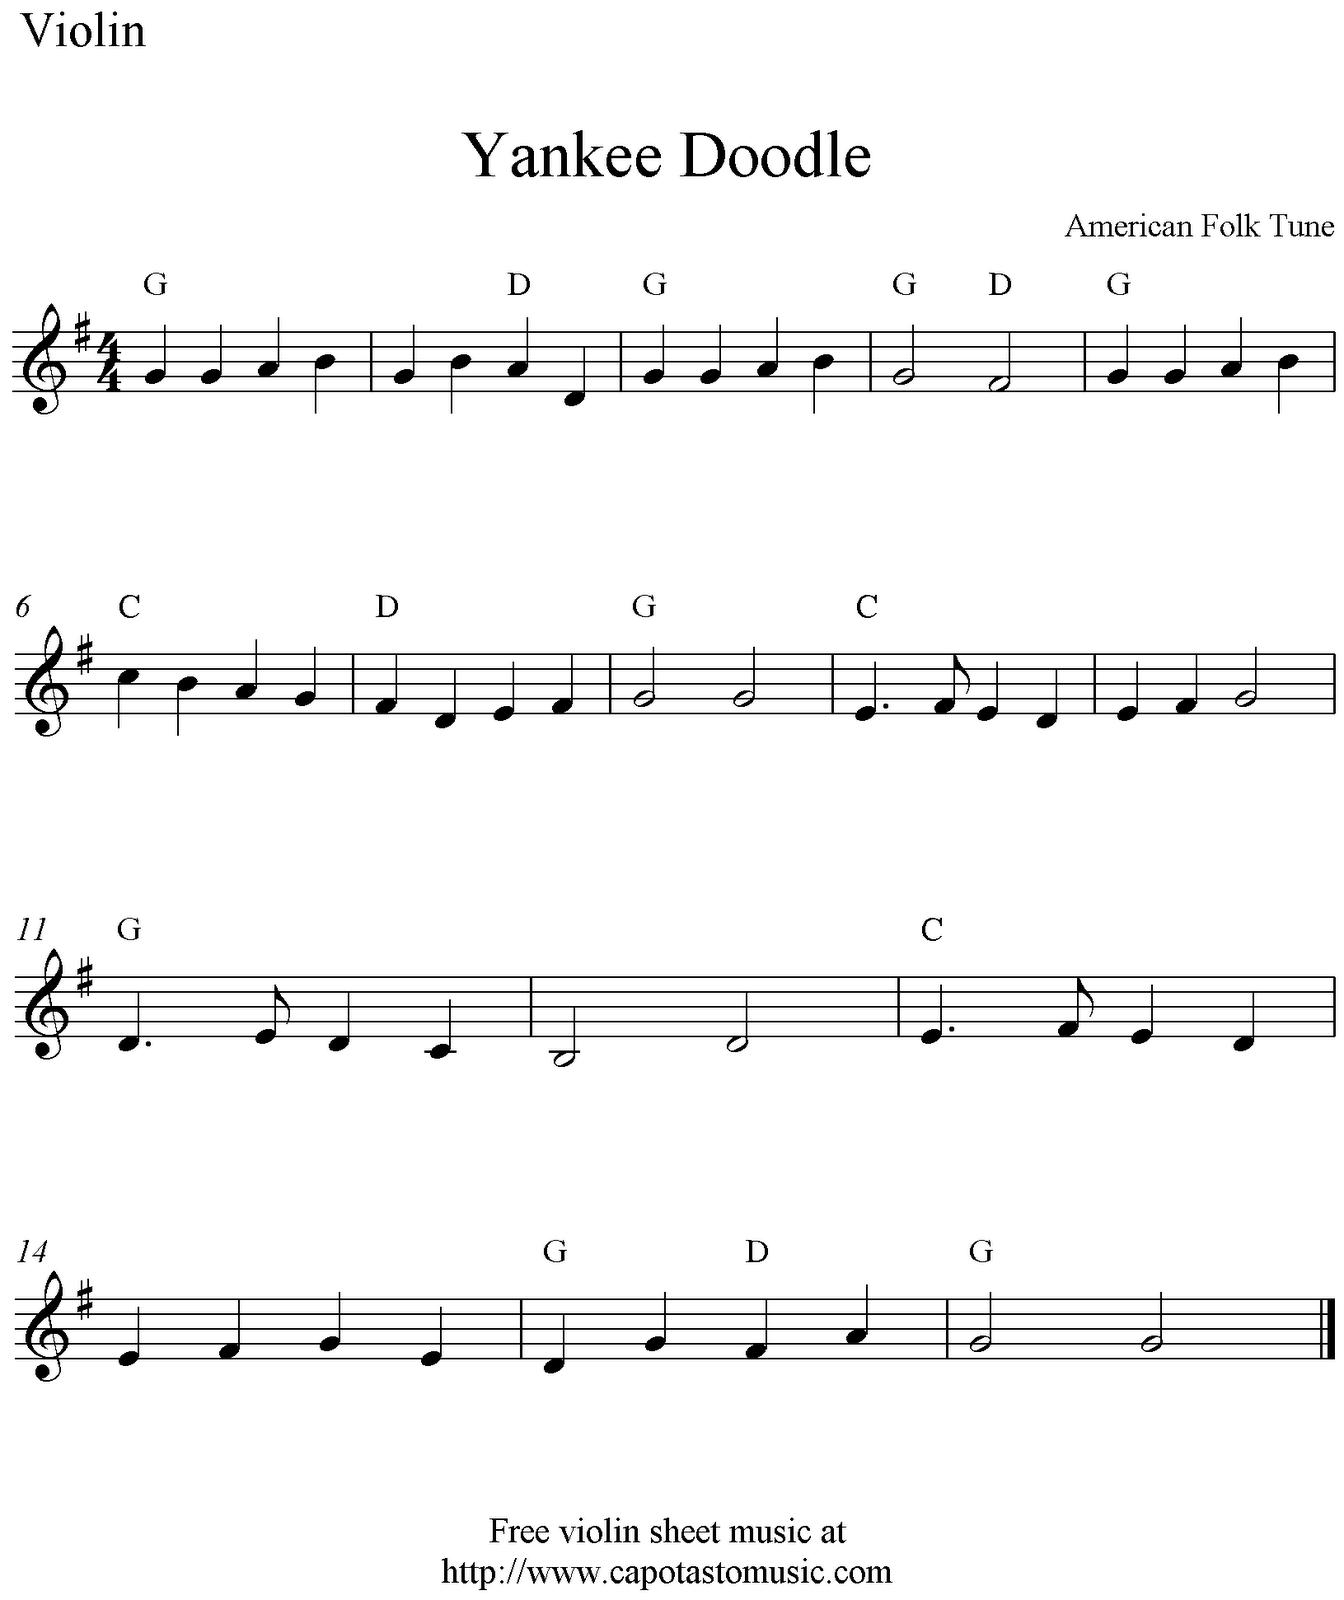 Yankee Doodle Dandy Sheet Music Yankee Doodle, free vi...